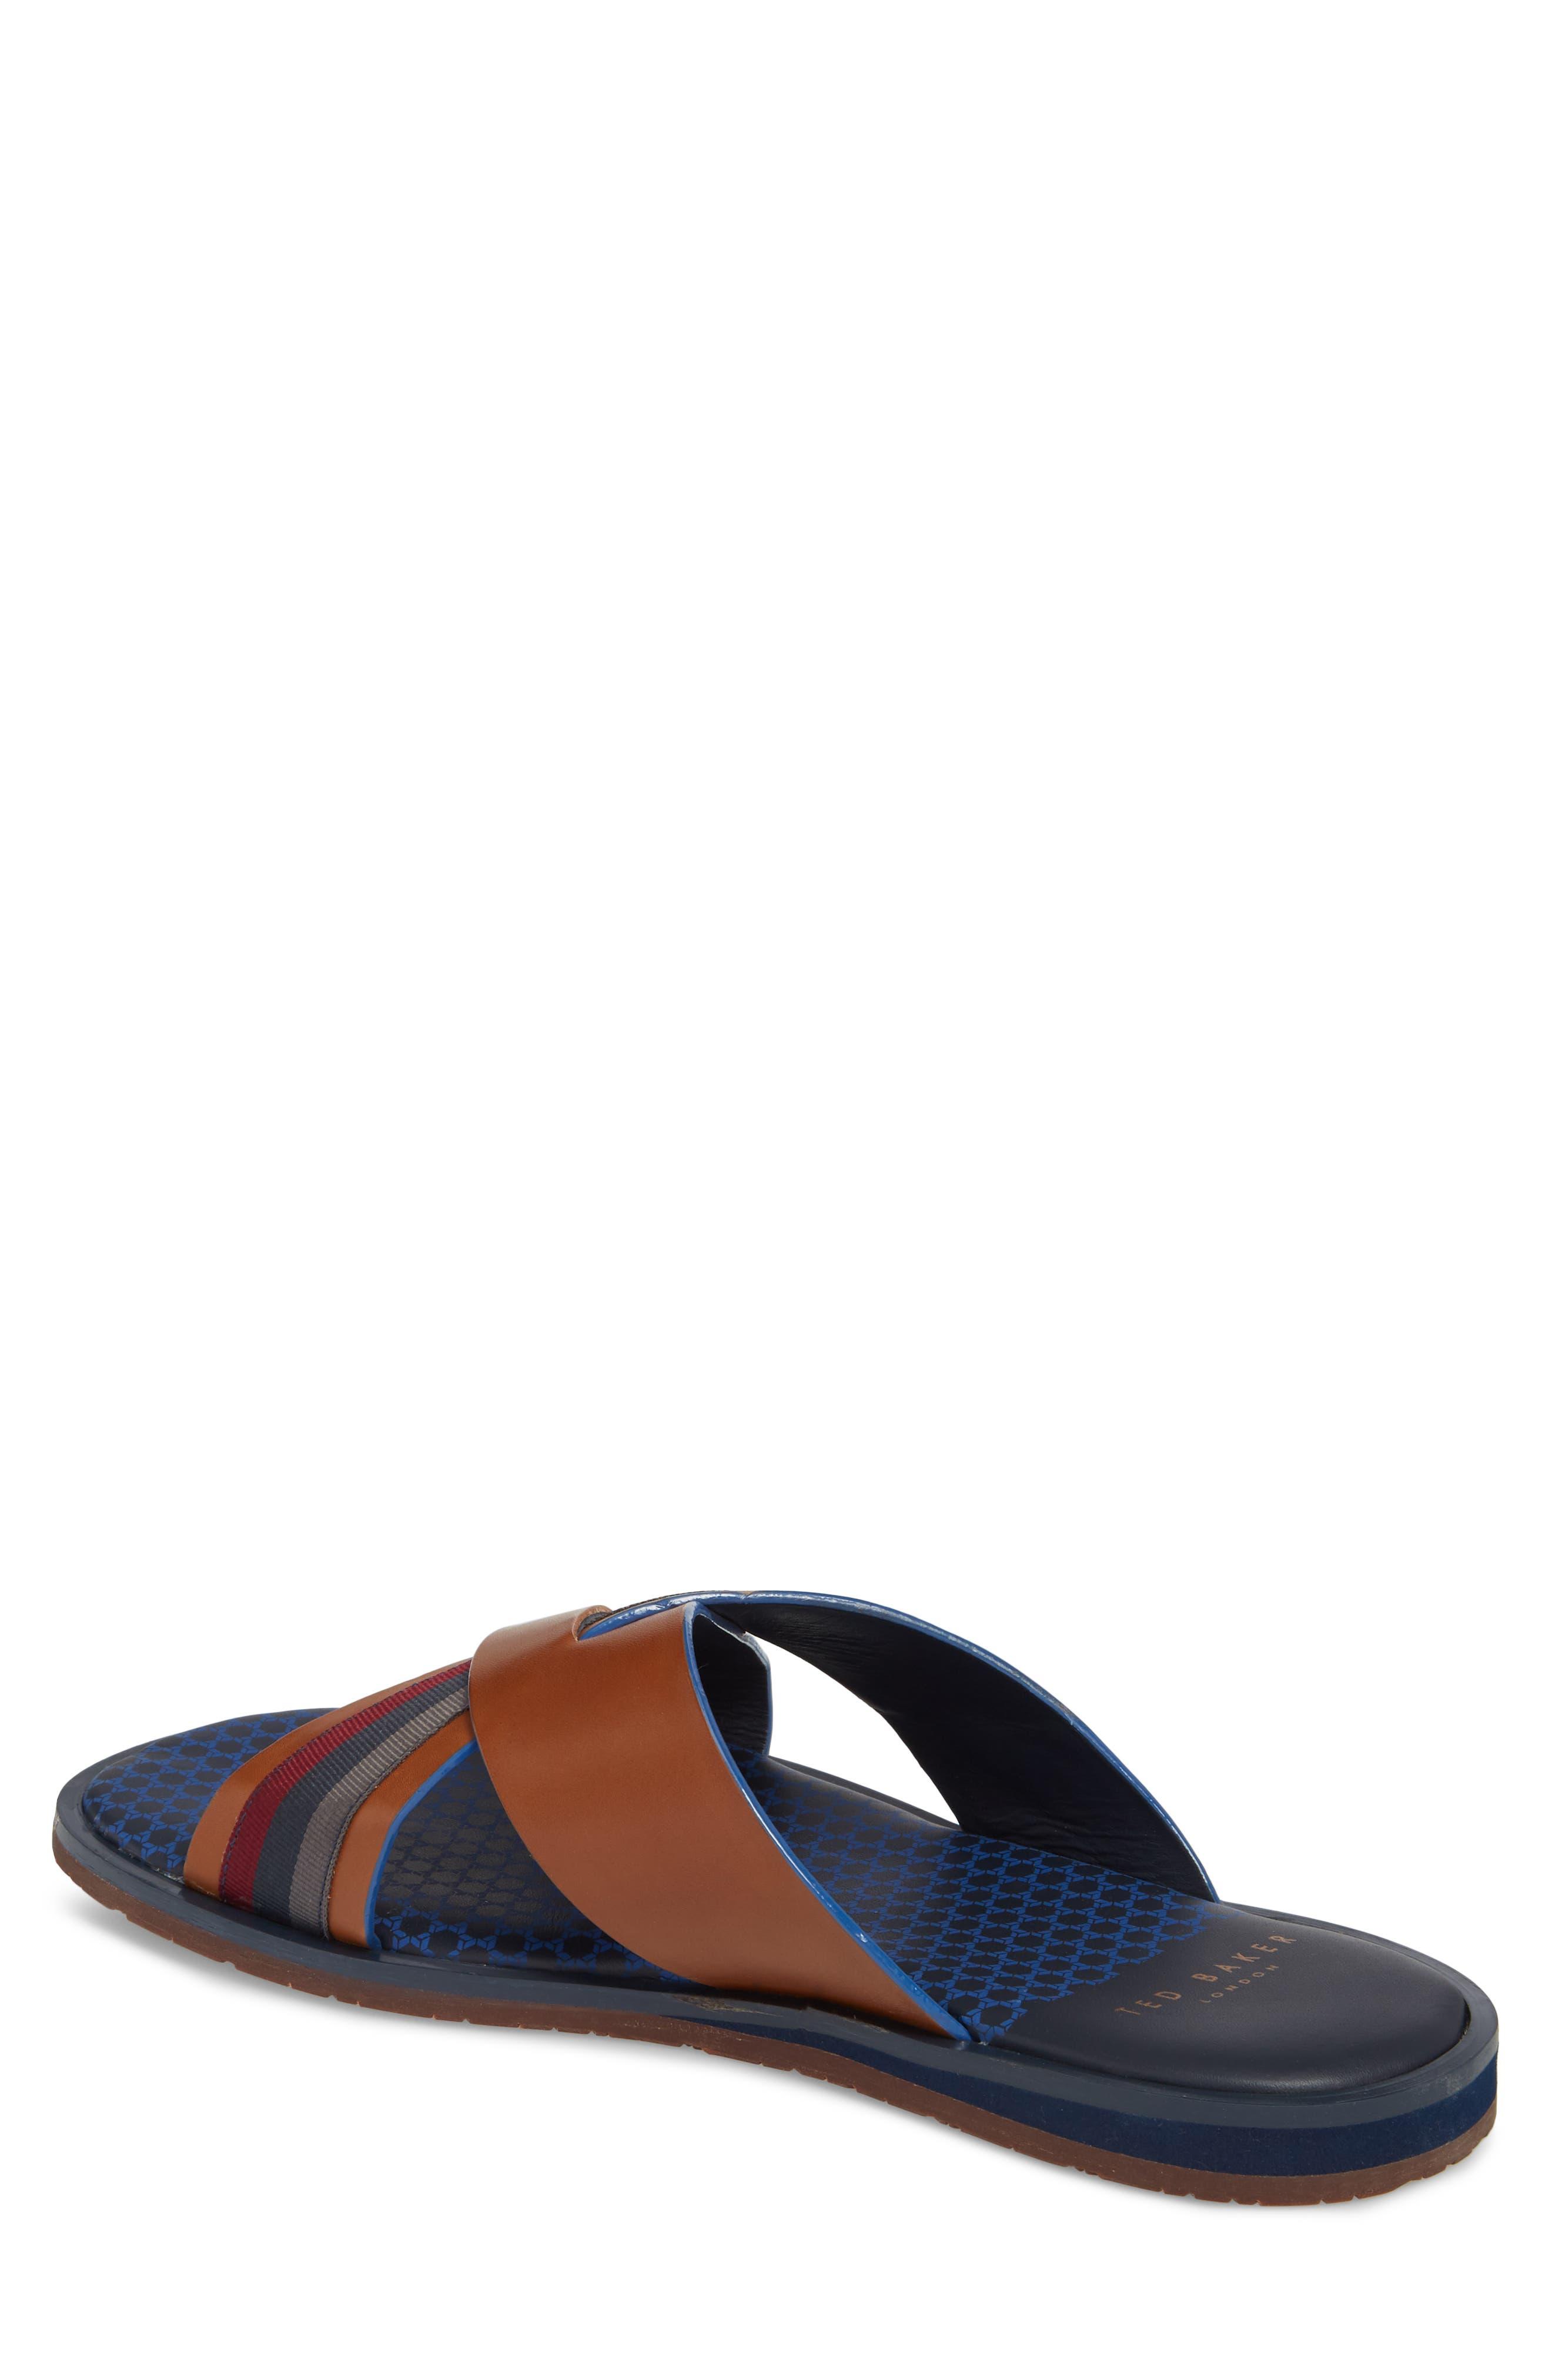 Farrull Cross Strap Slide Sandal,                             Alternate thumbnail 2, color,                             Tan Leather/ Textile